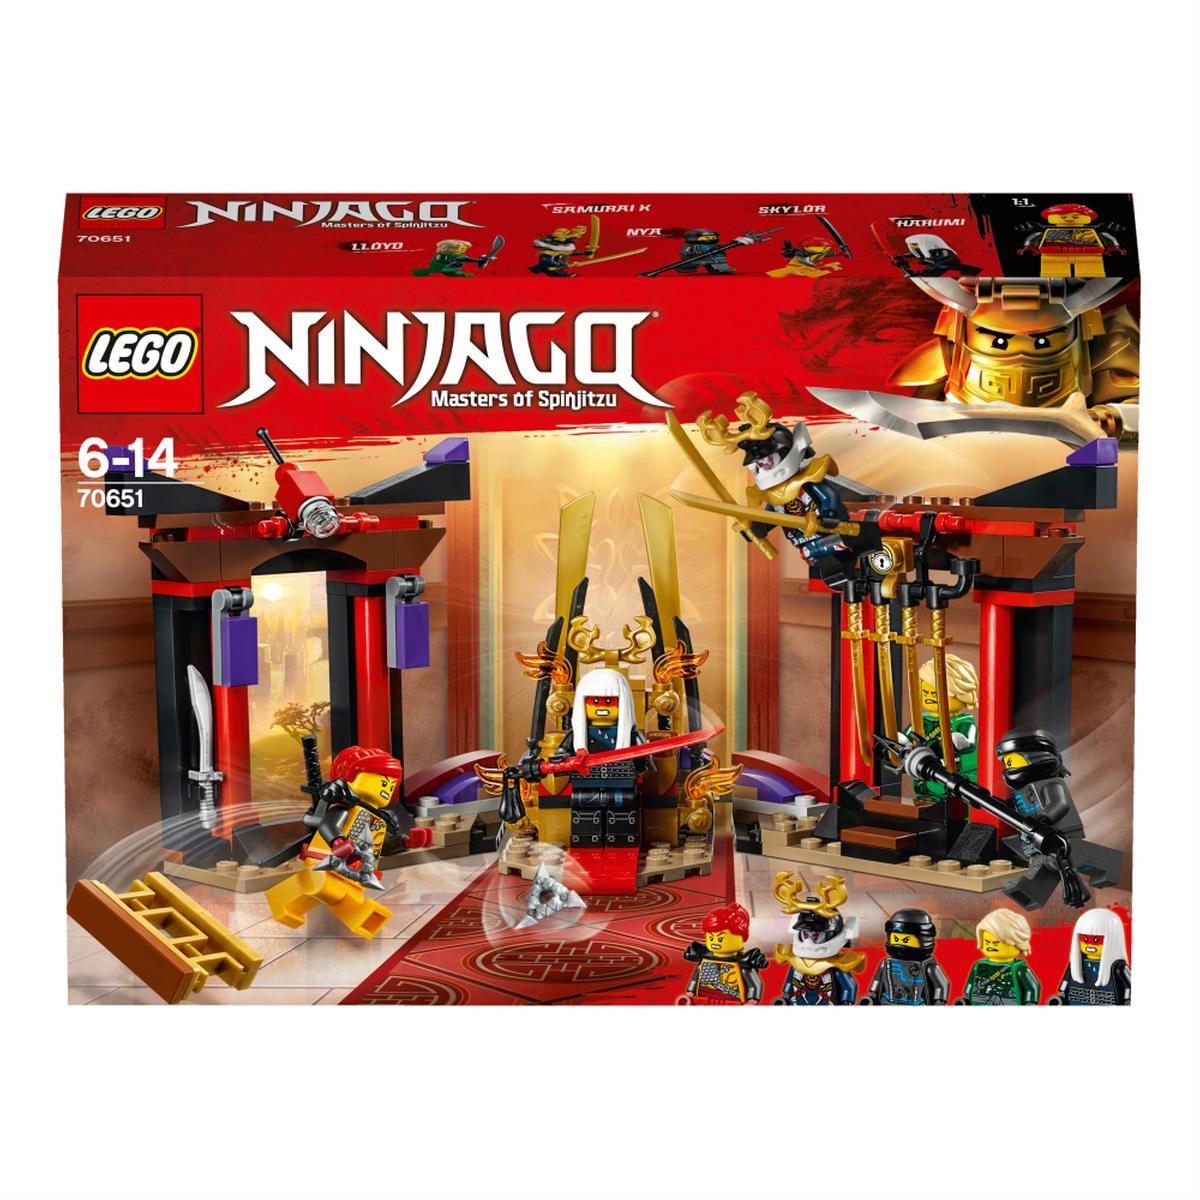 LEGO Ninjago - Duelo en la Sala del Trono - 70651